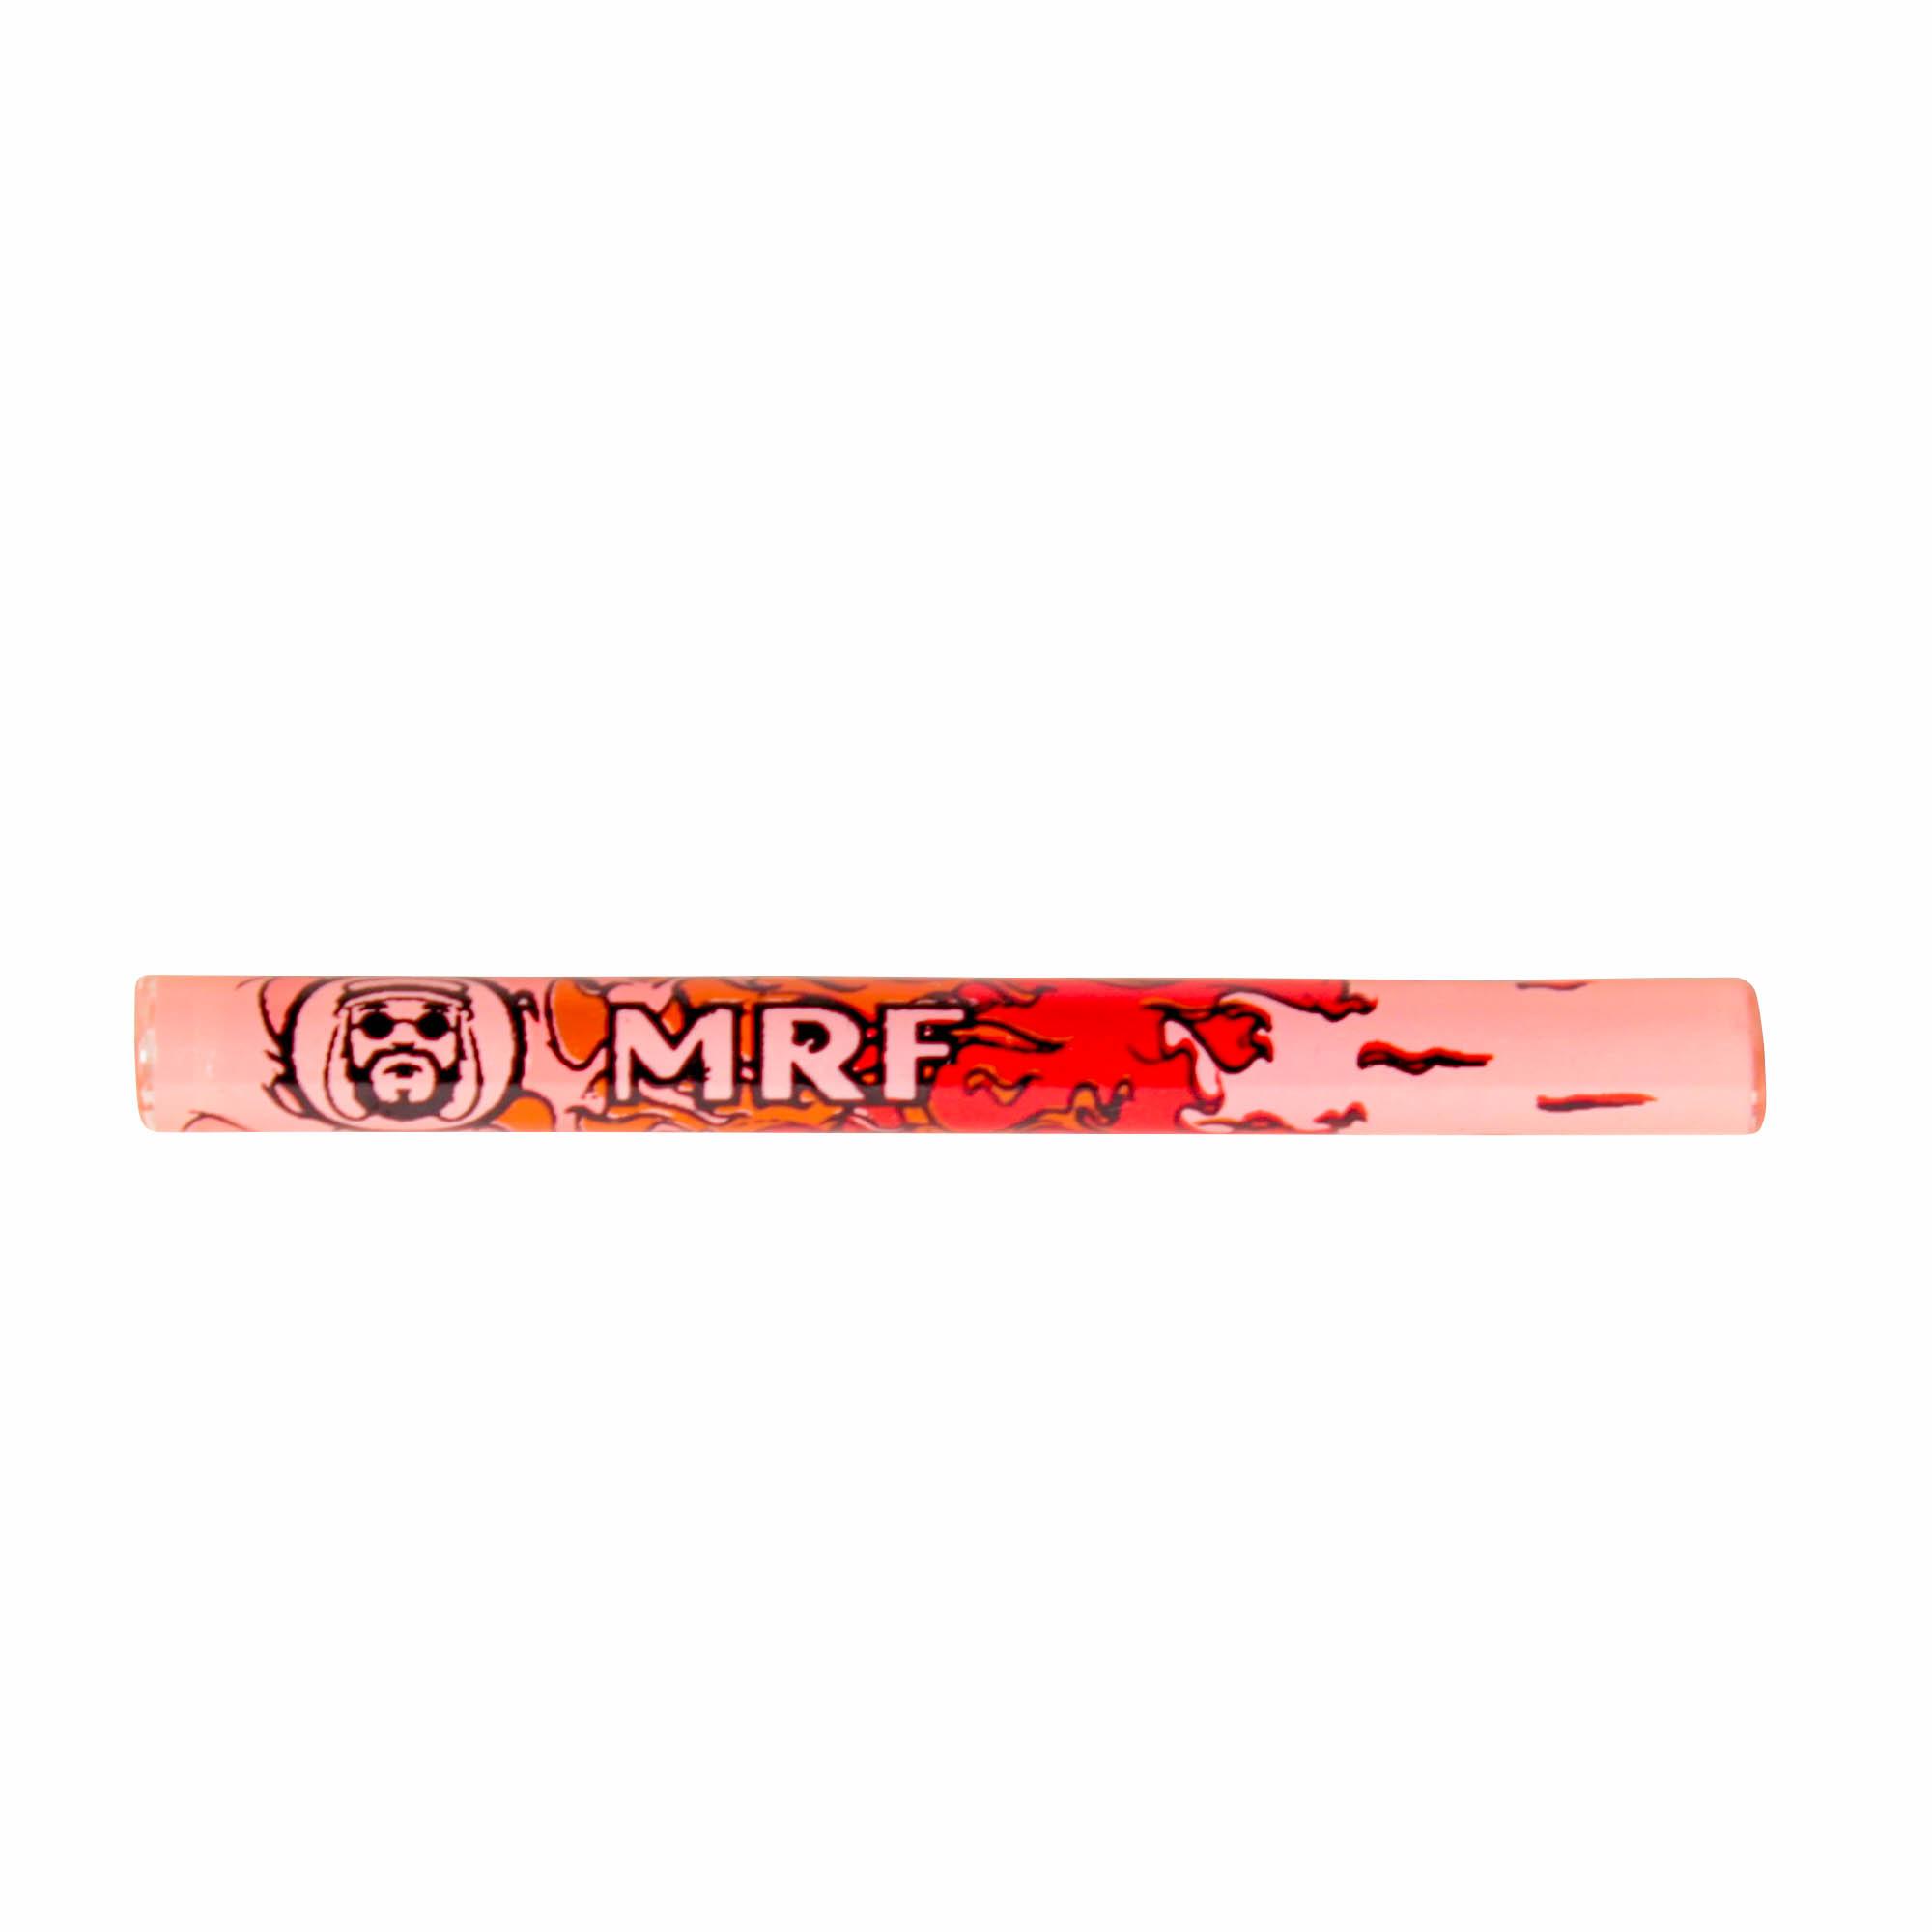 Piteira de Vidro MRF Elements Collection - Fogo (6 mm)  - Mr. Fumo